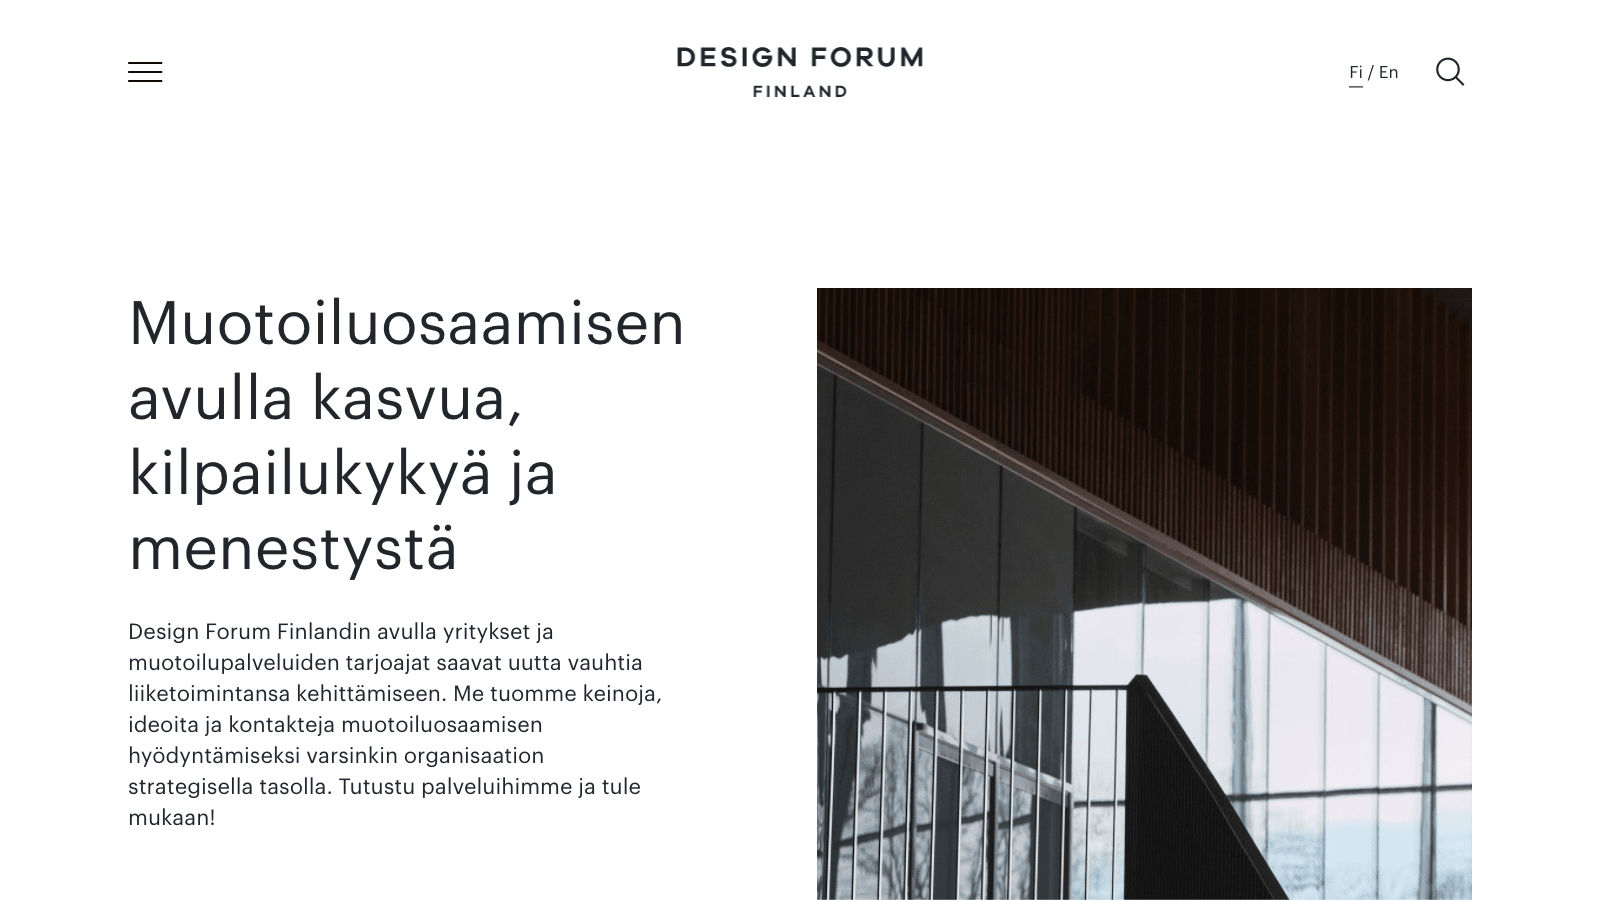 Design Forum Finland